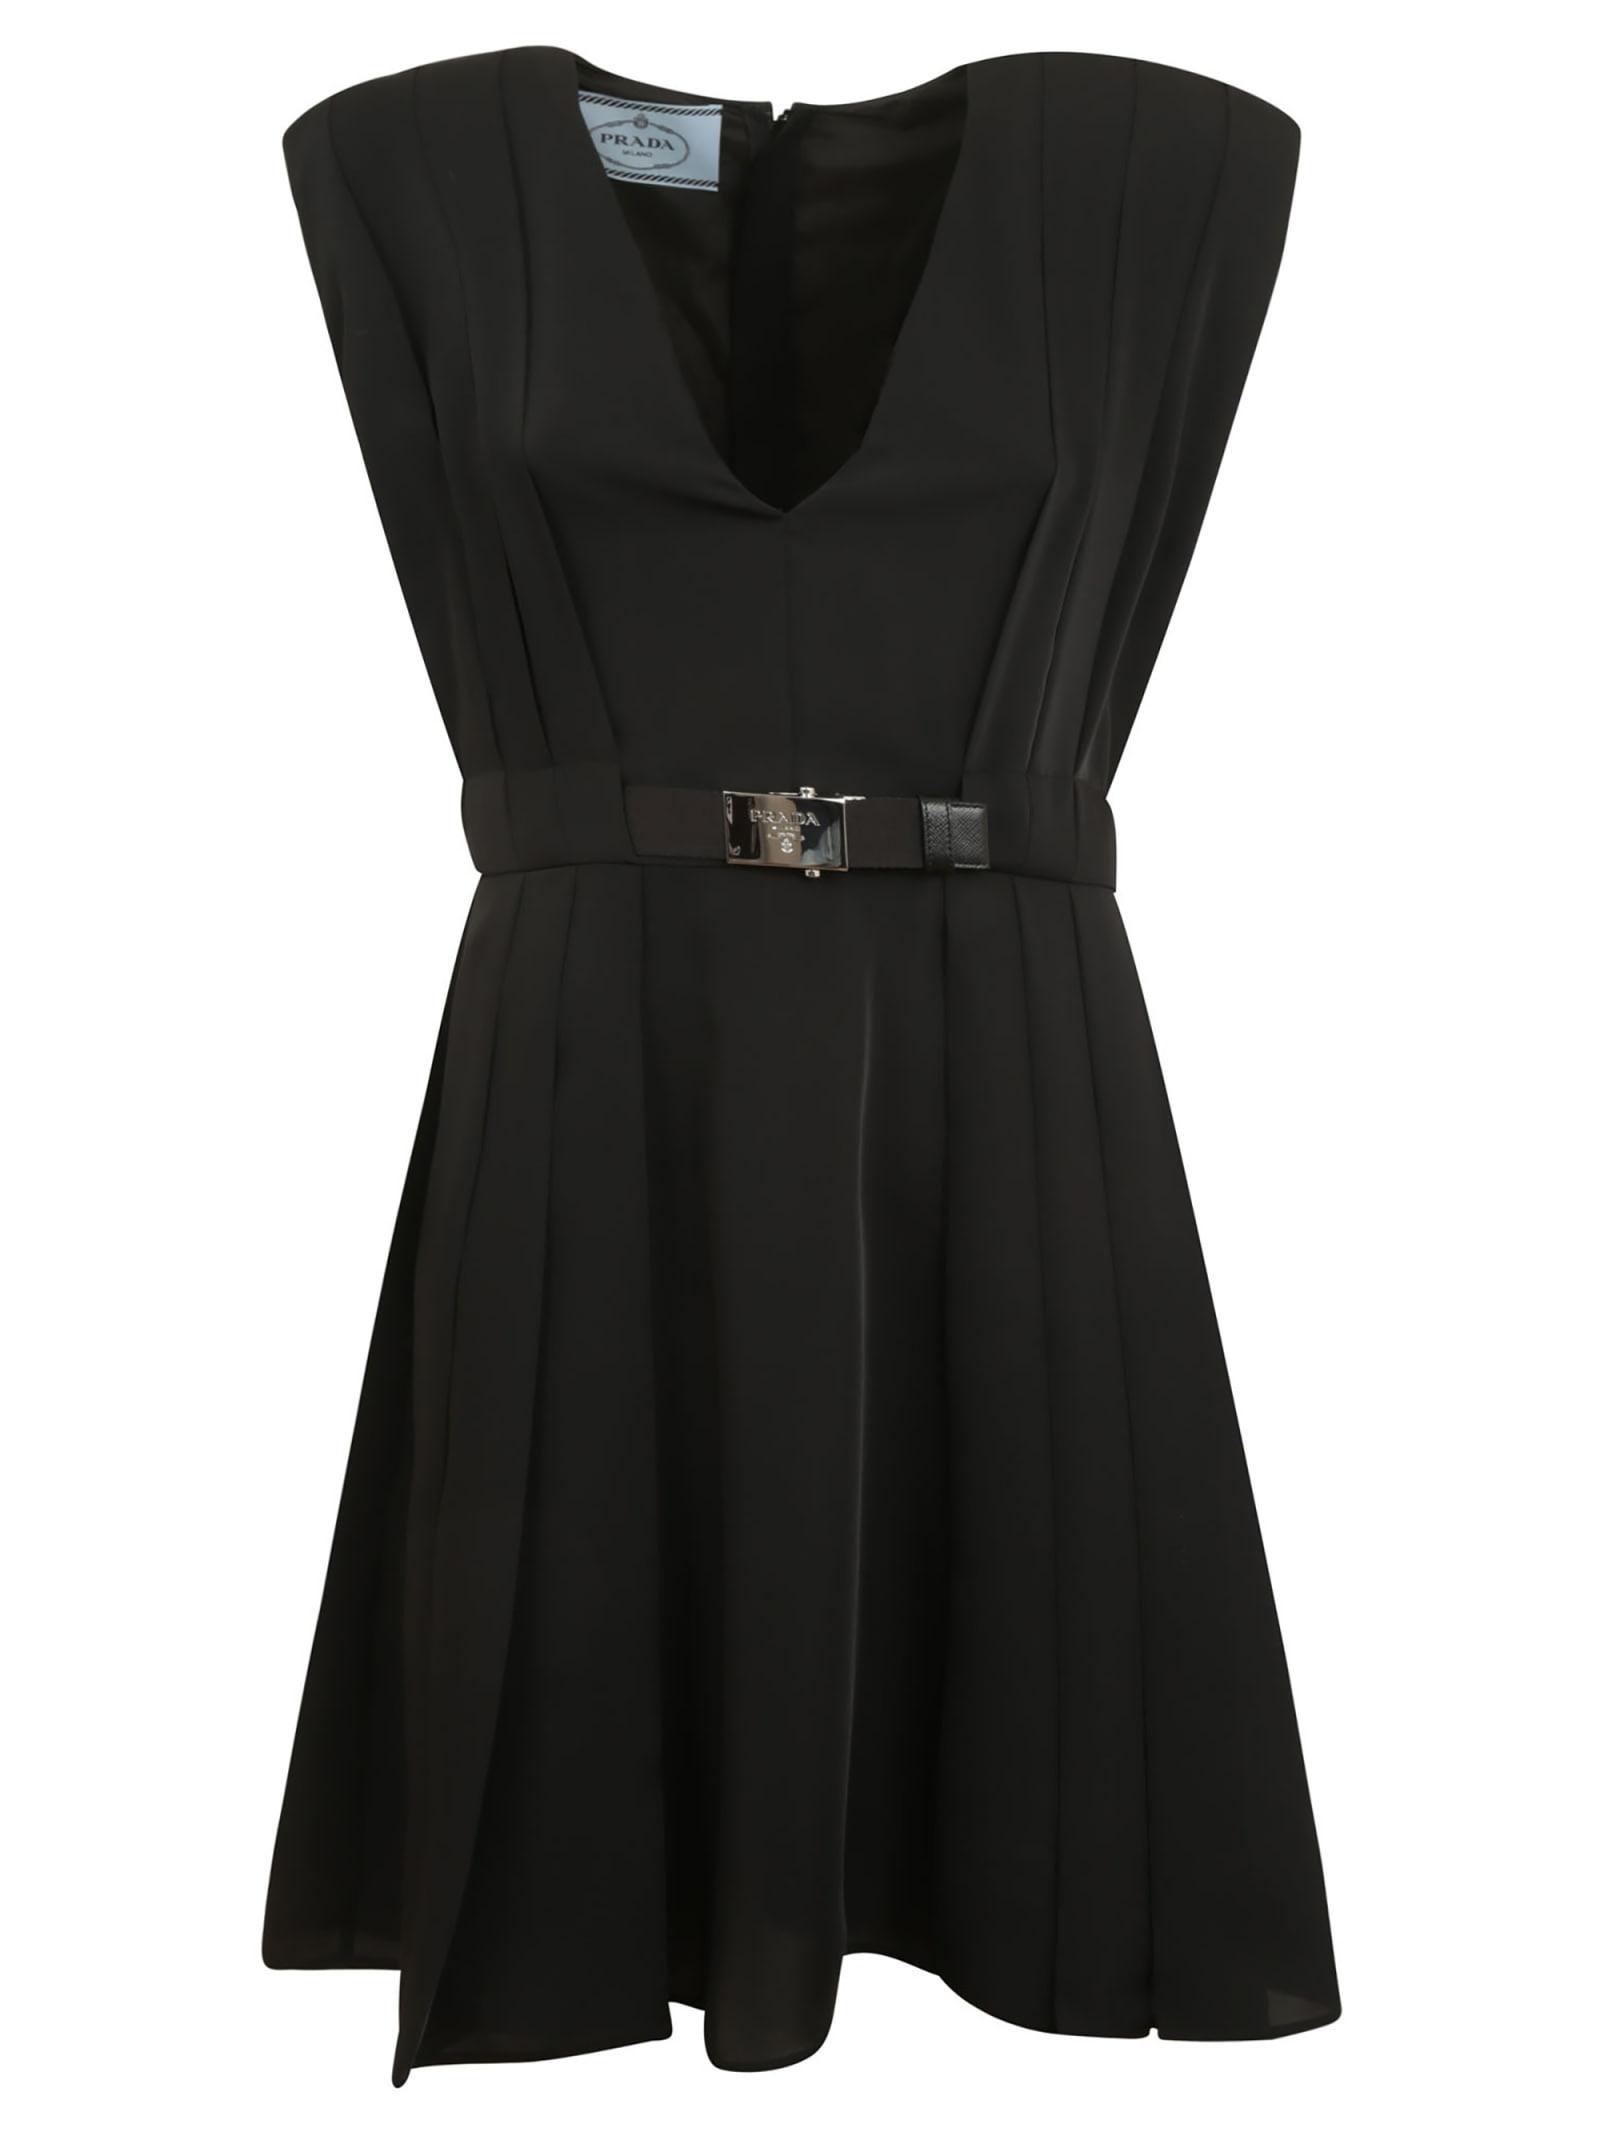 Prada Sleeveless Belted V-neck Dress